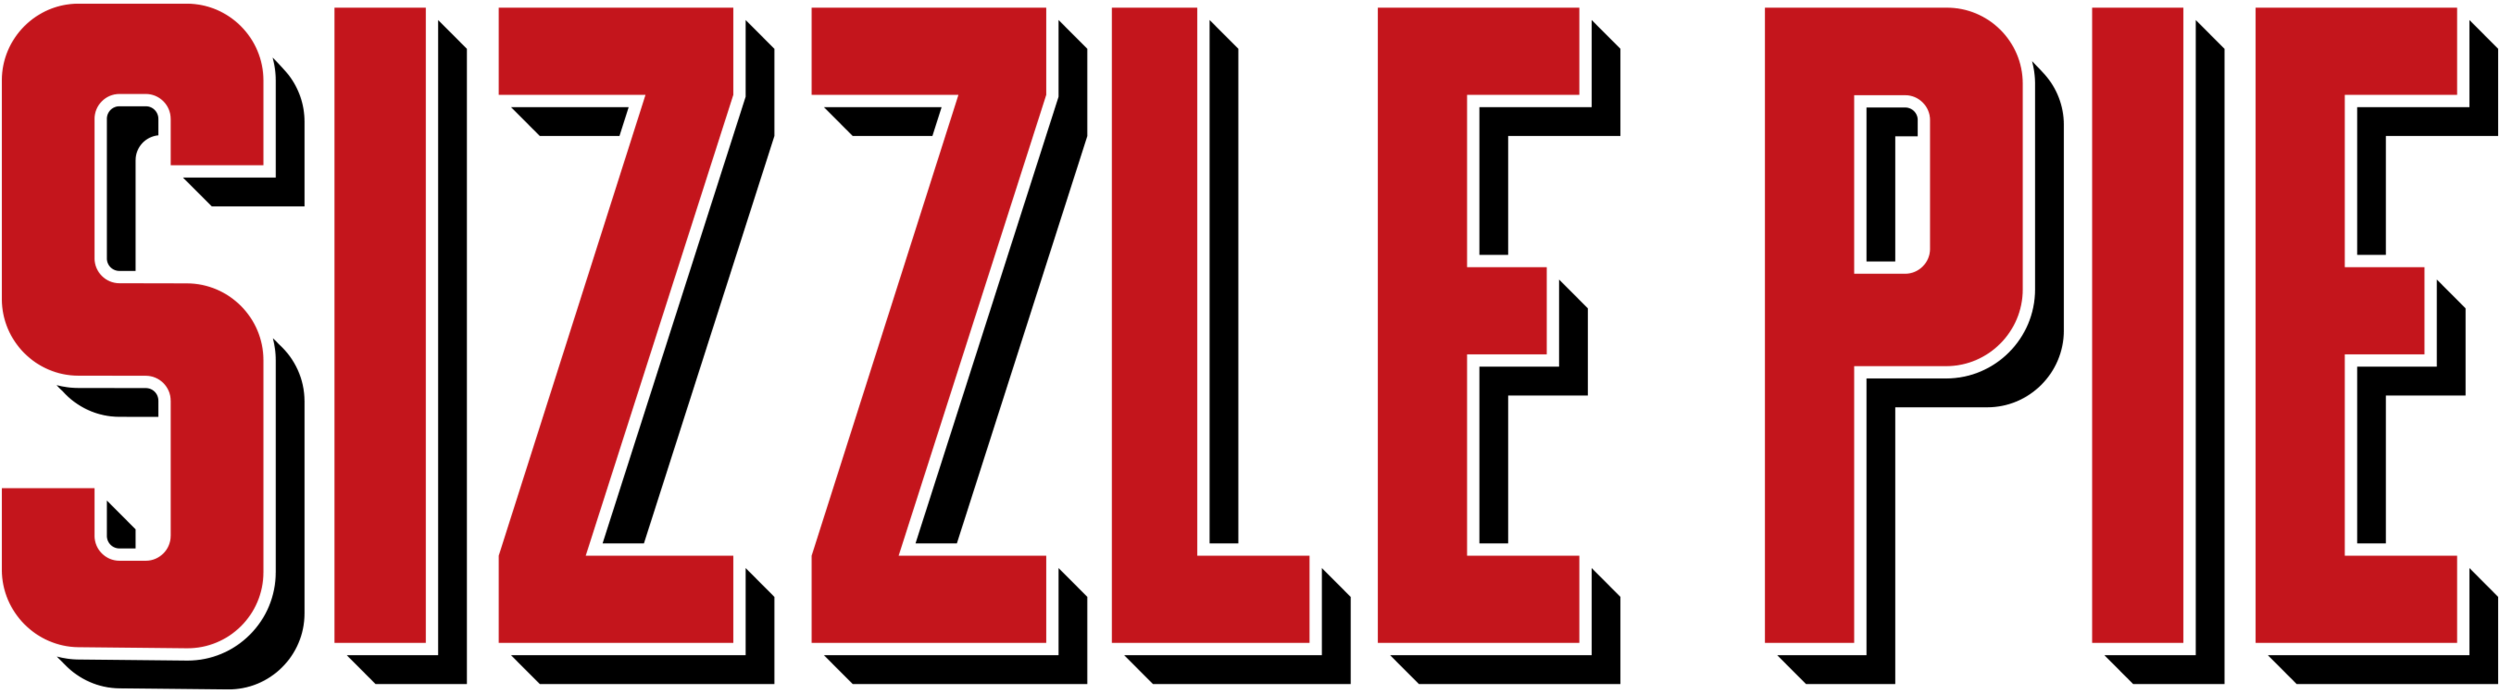 sizzlepie_logo-dark (1).png